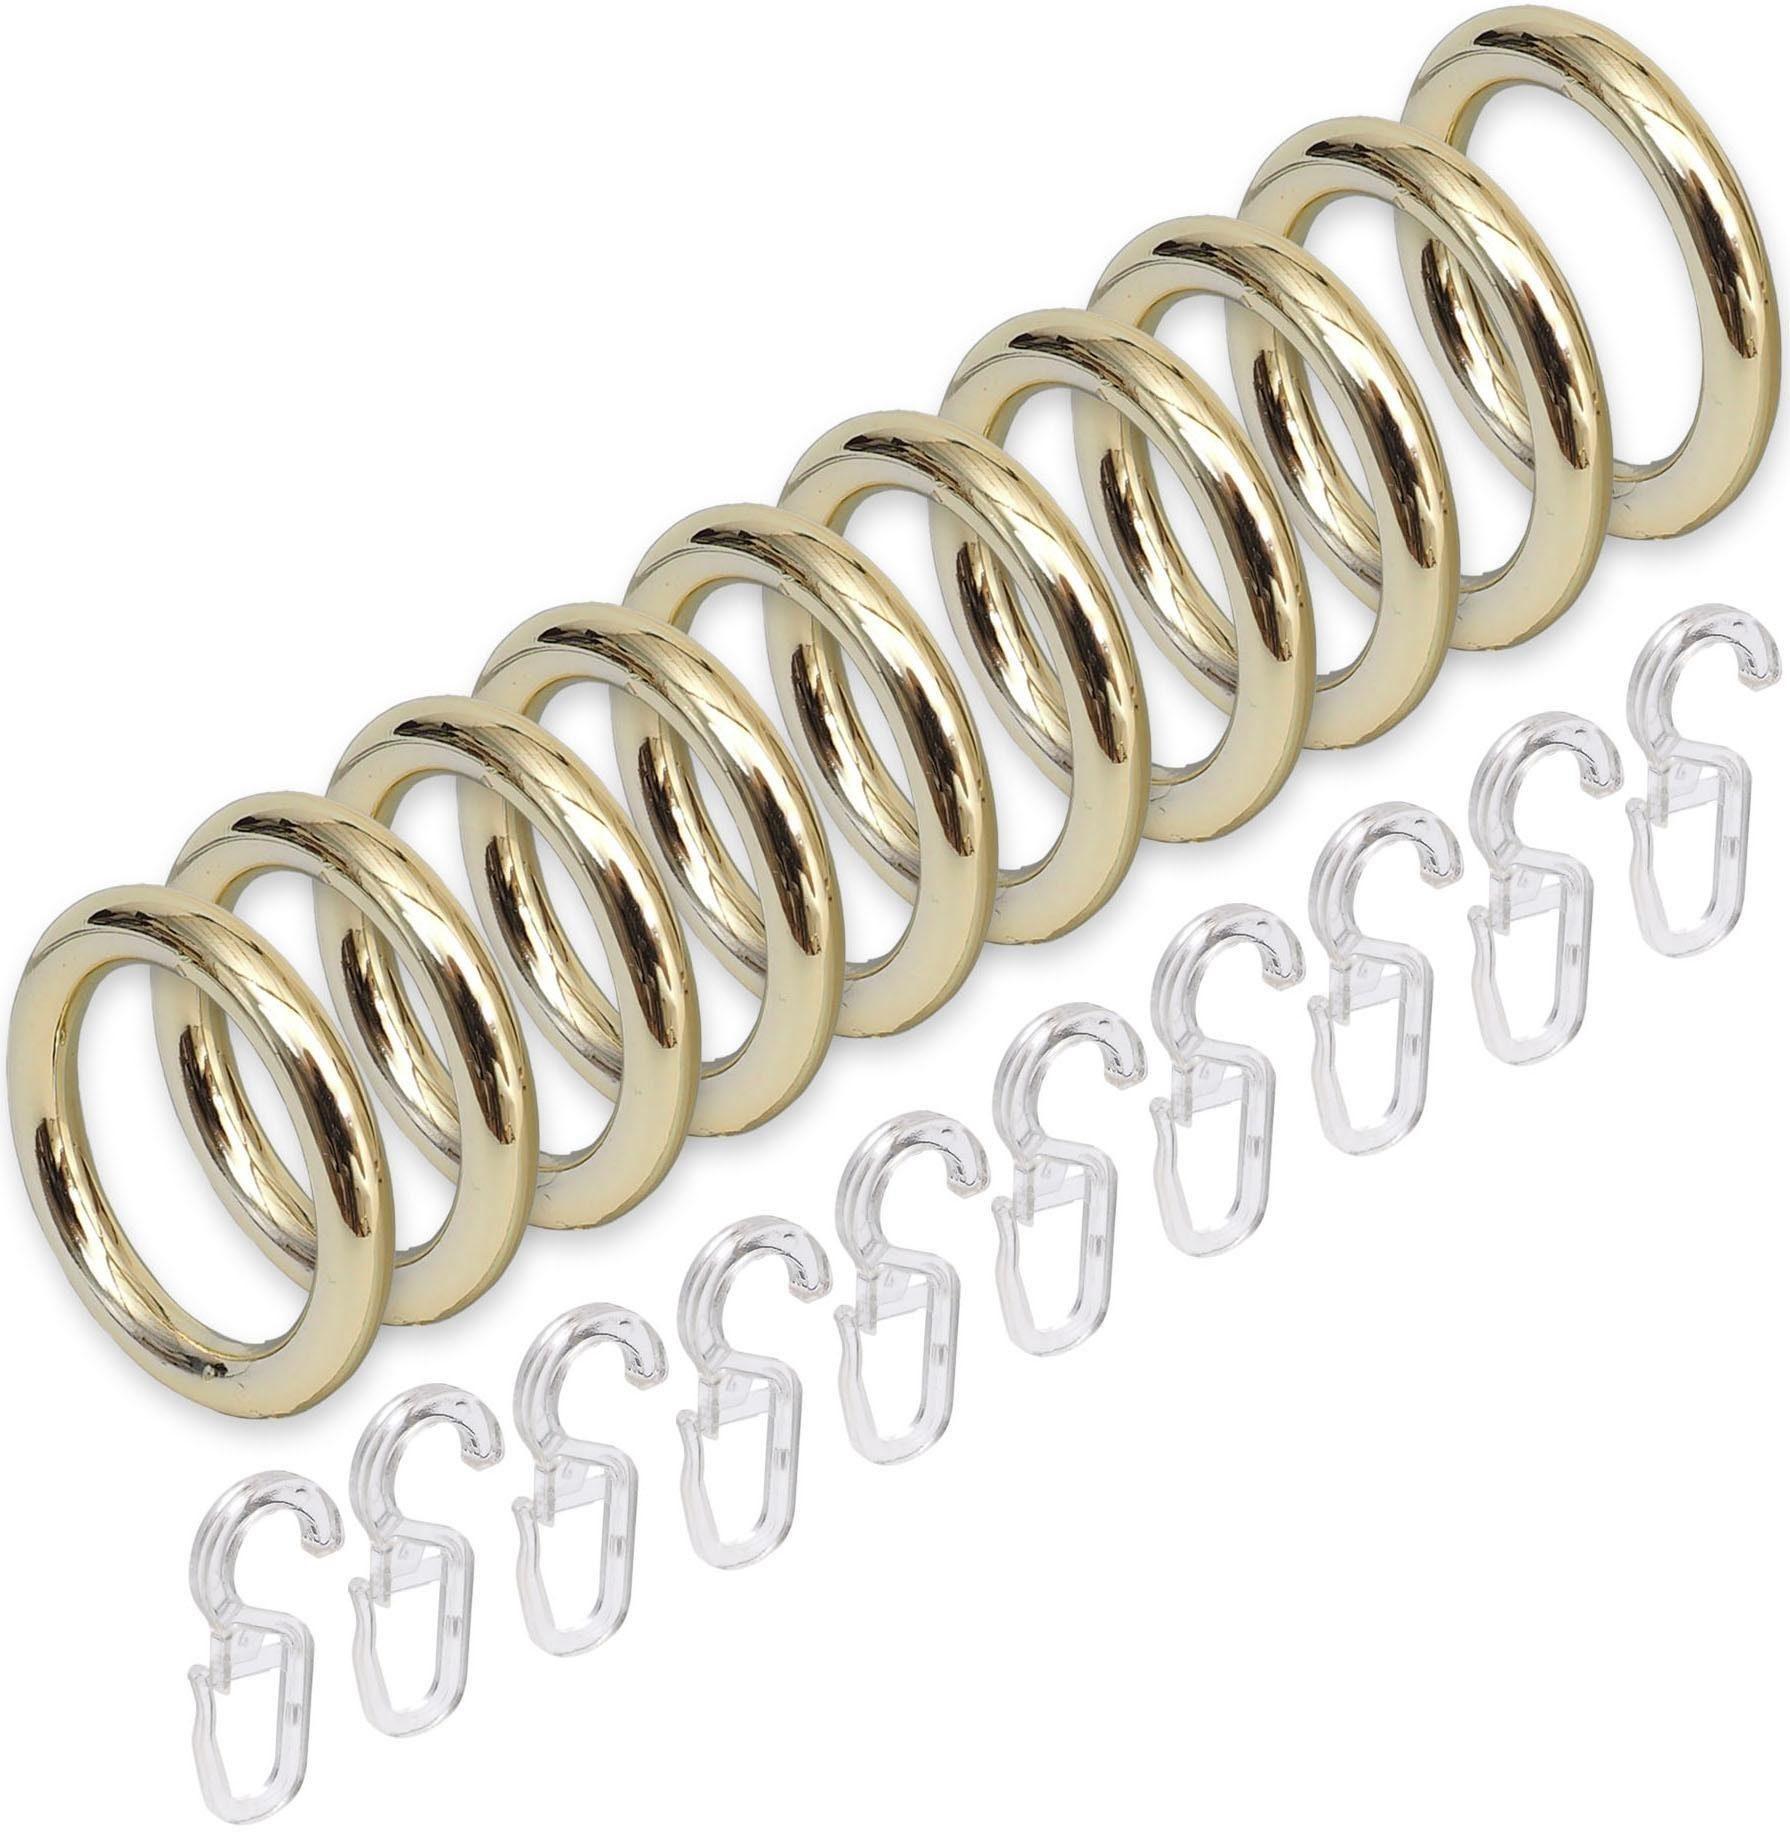 Ring-Breite 9 mm GARDINIA Gardinenringe f/ür Gardinenstangen /Ø 28 mm 10 St/ück Holz Inklusive Faltenlegehaken Kiefer